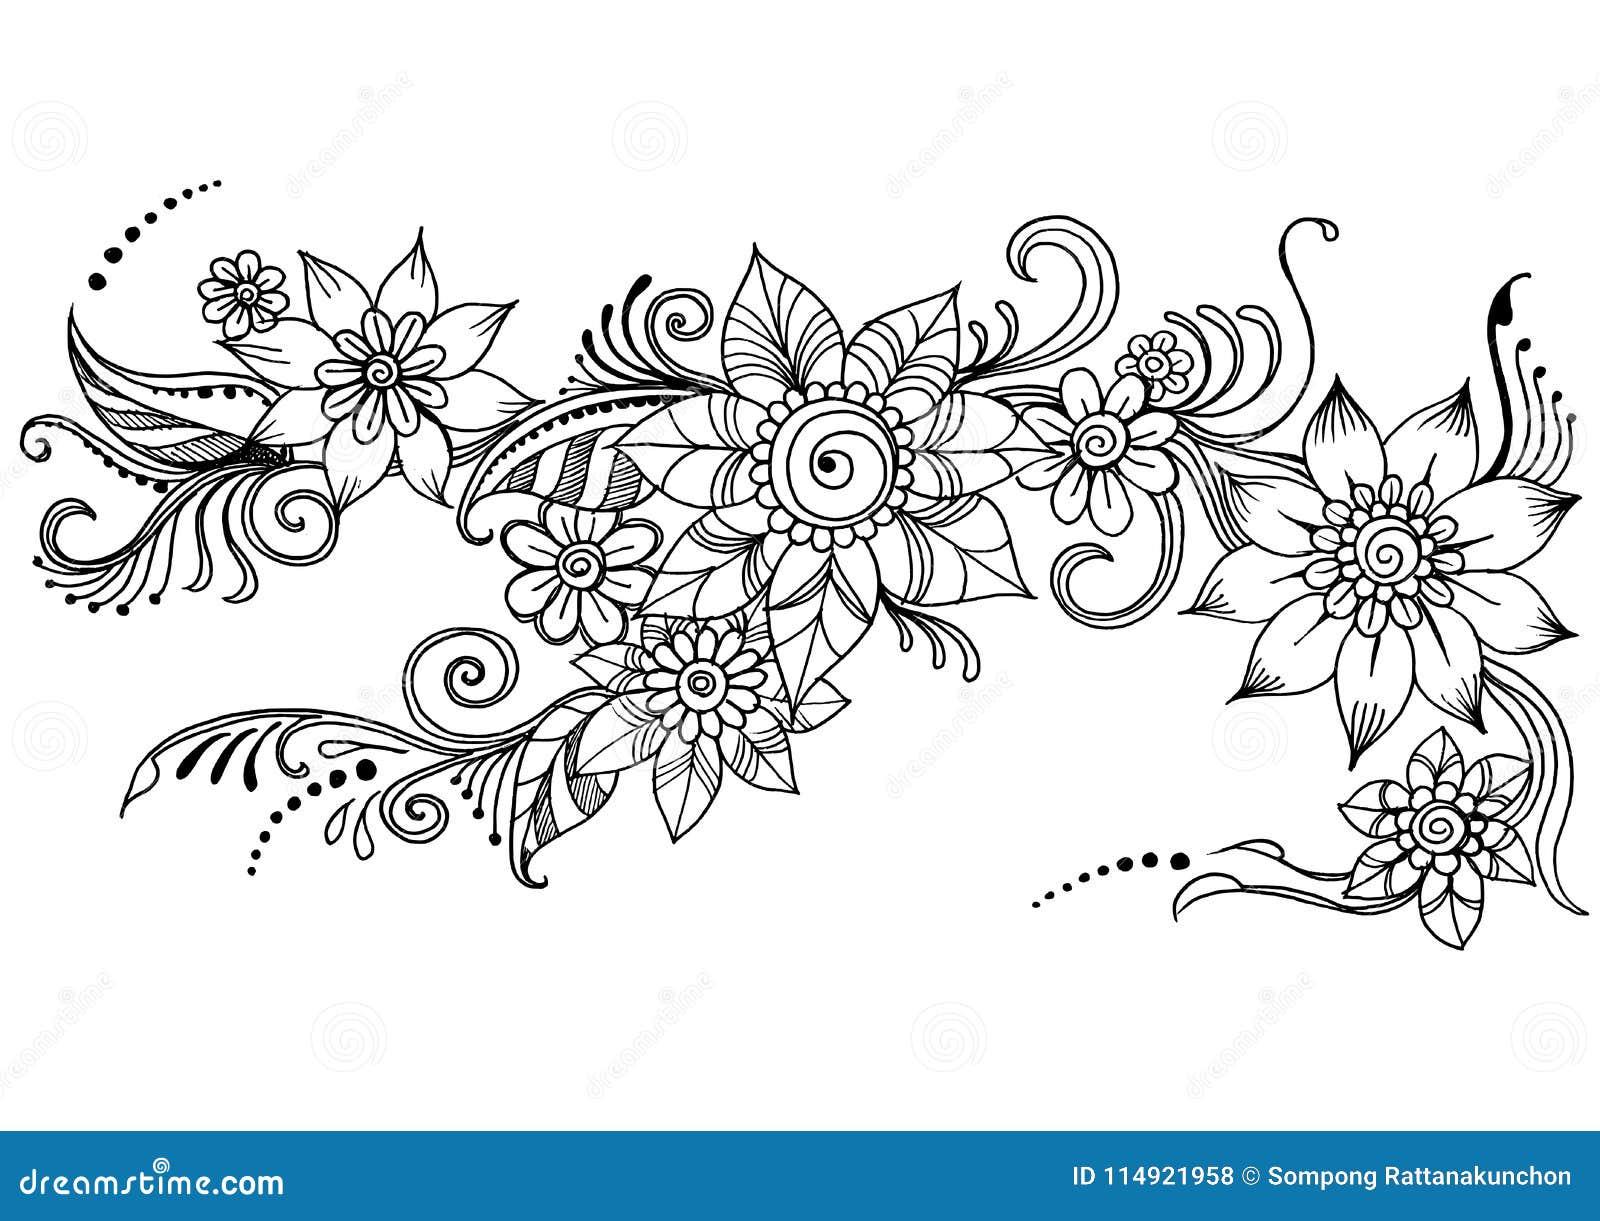 Doodle Art Flowers,Zentangle Abstract Flower. Vector Illustration ...